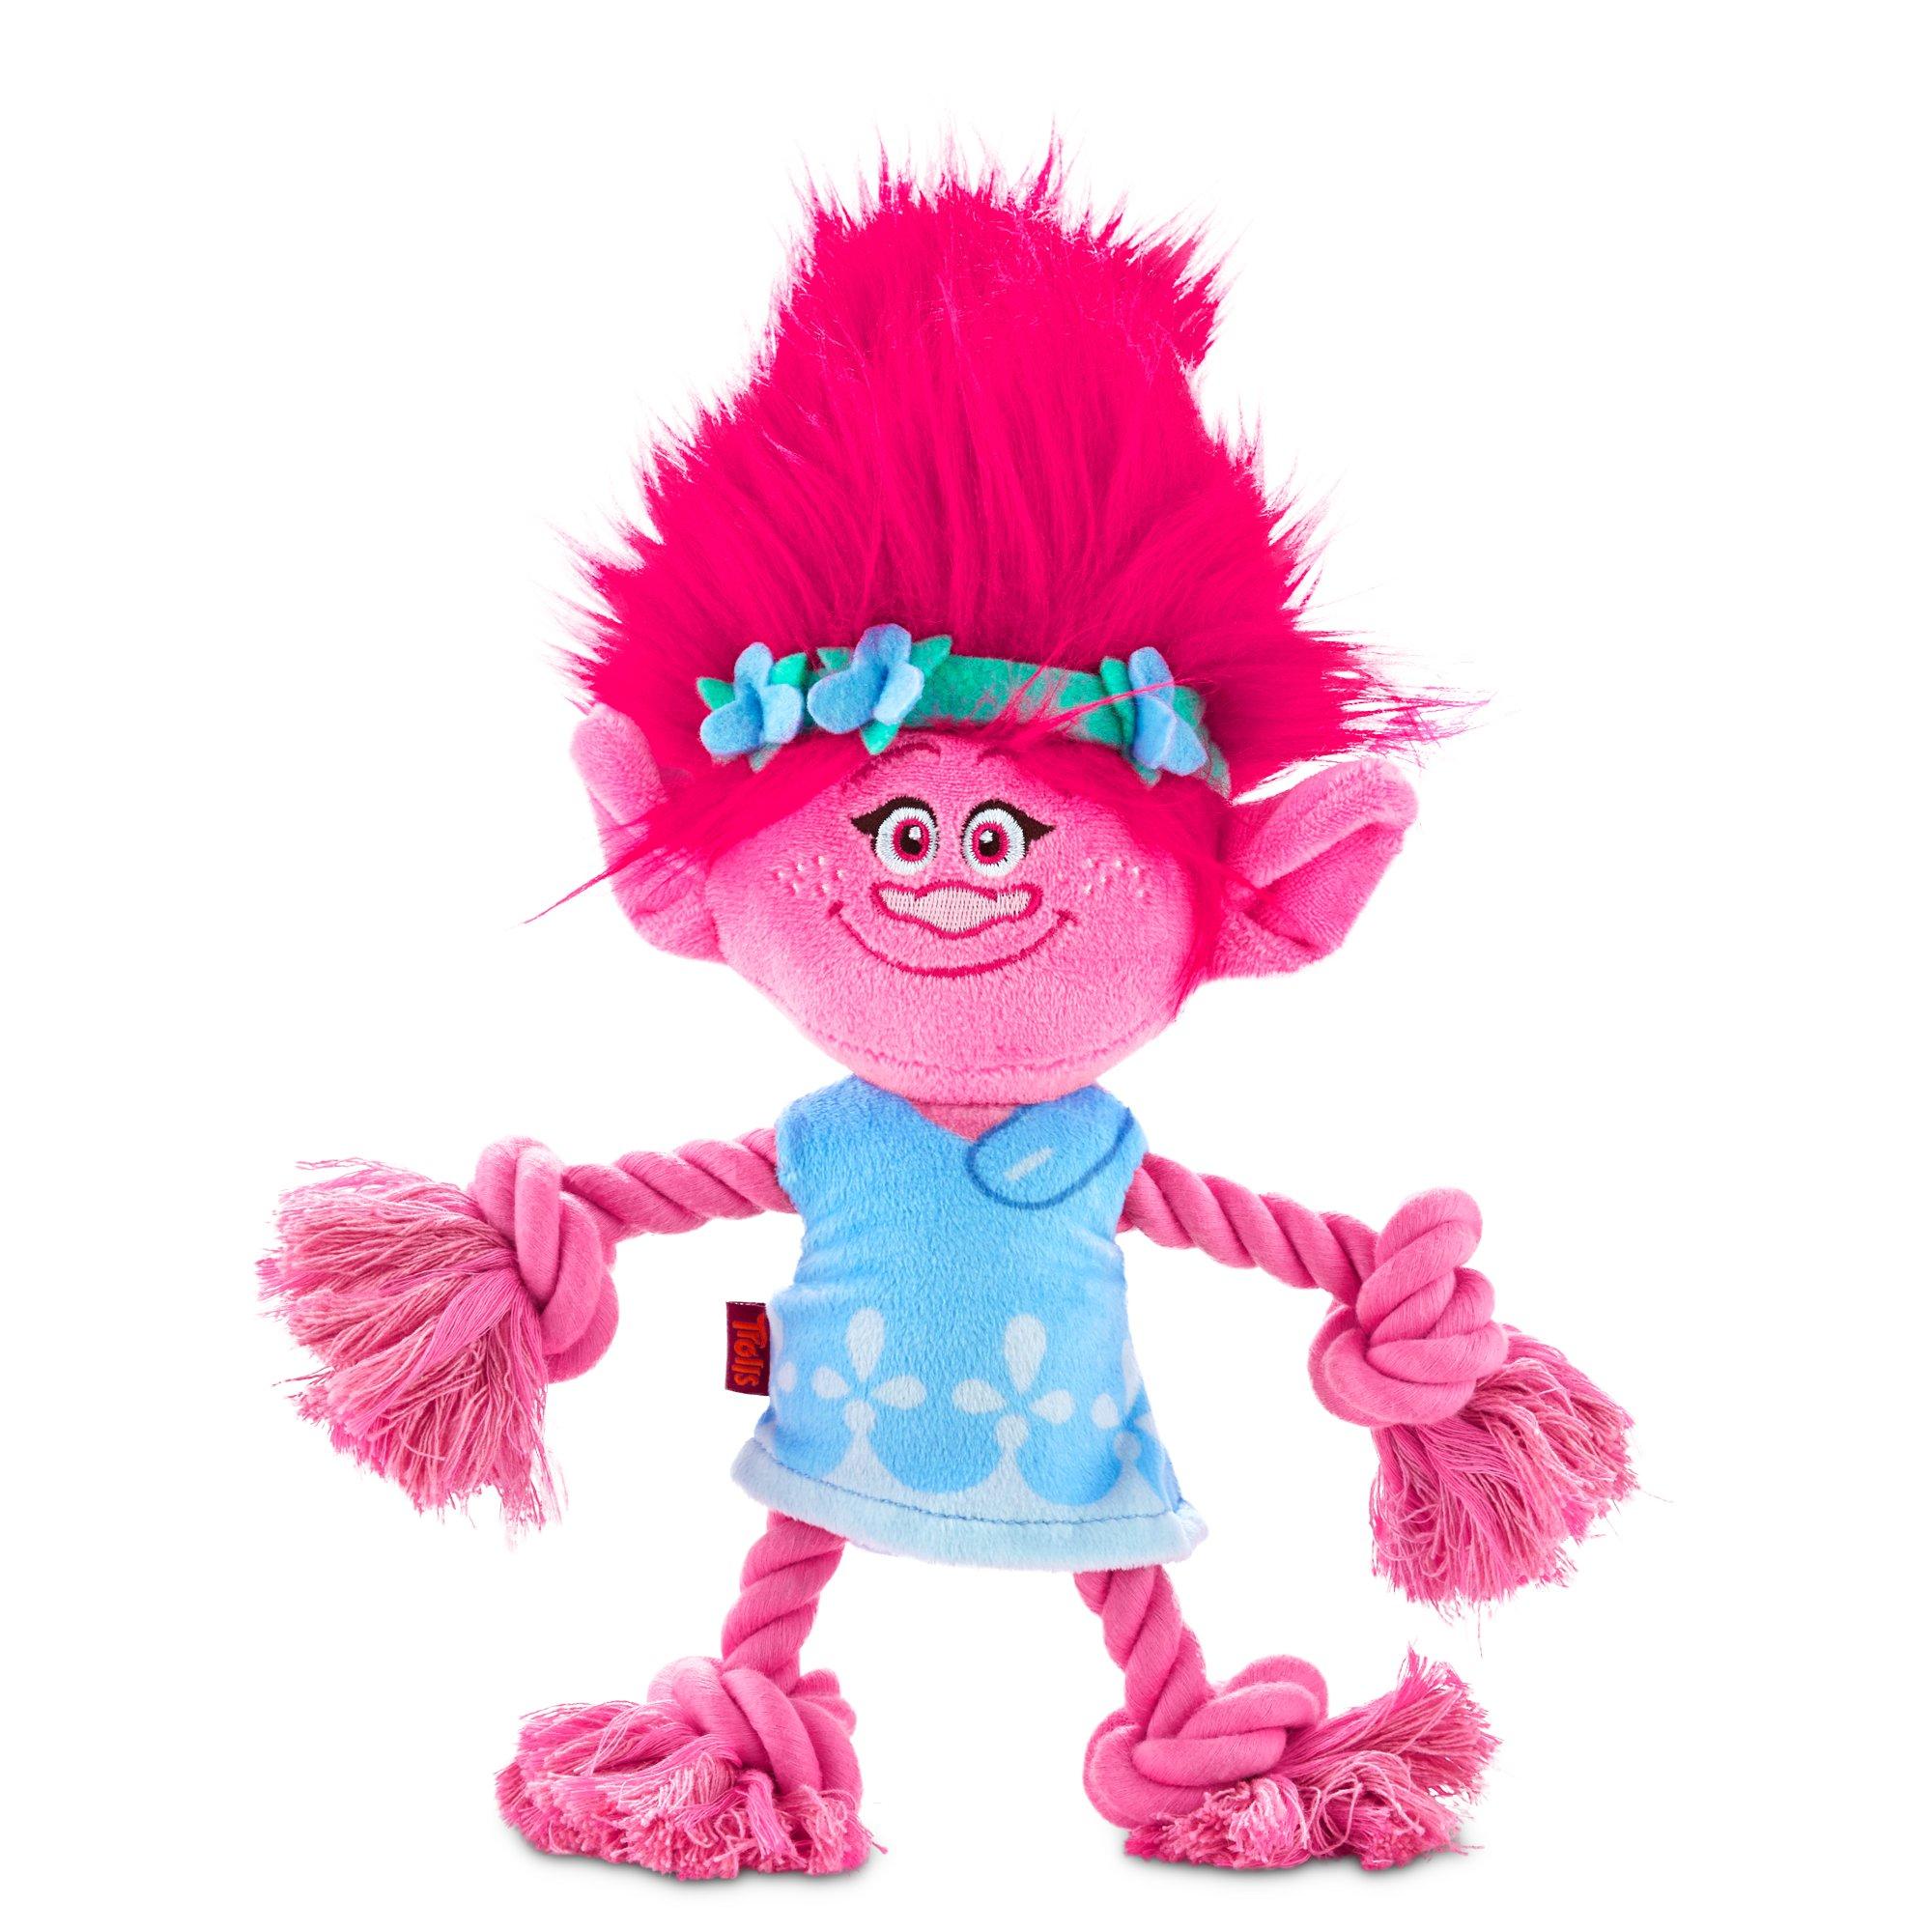 Trolls Poppy Plush with Rope Dog Toy